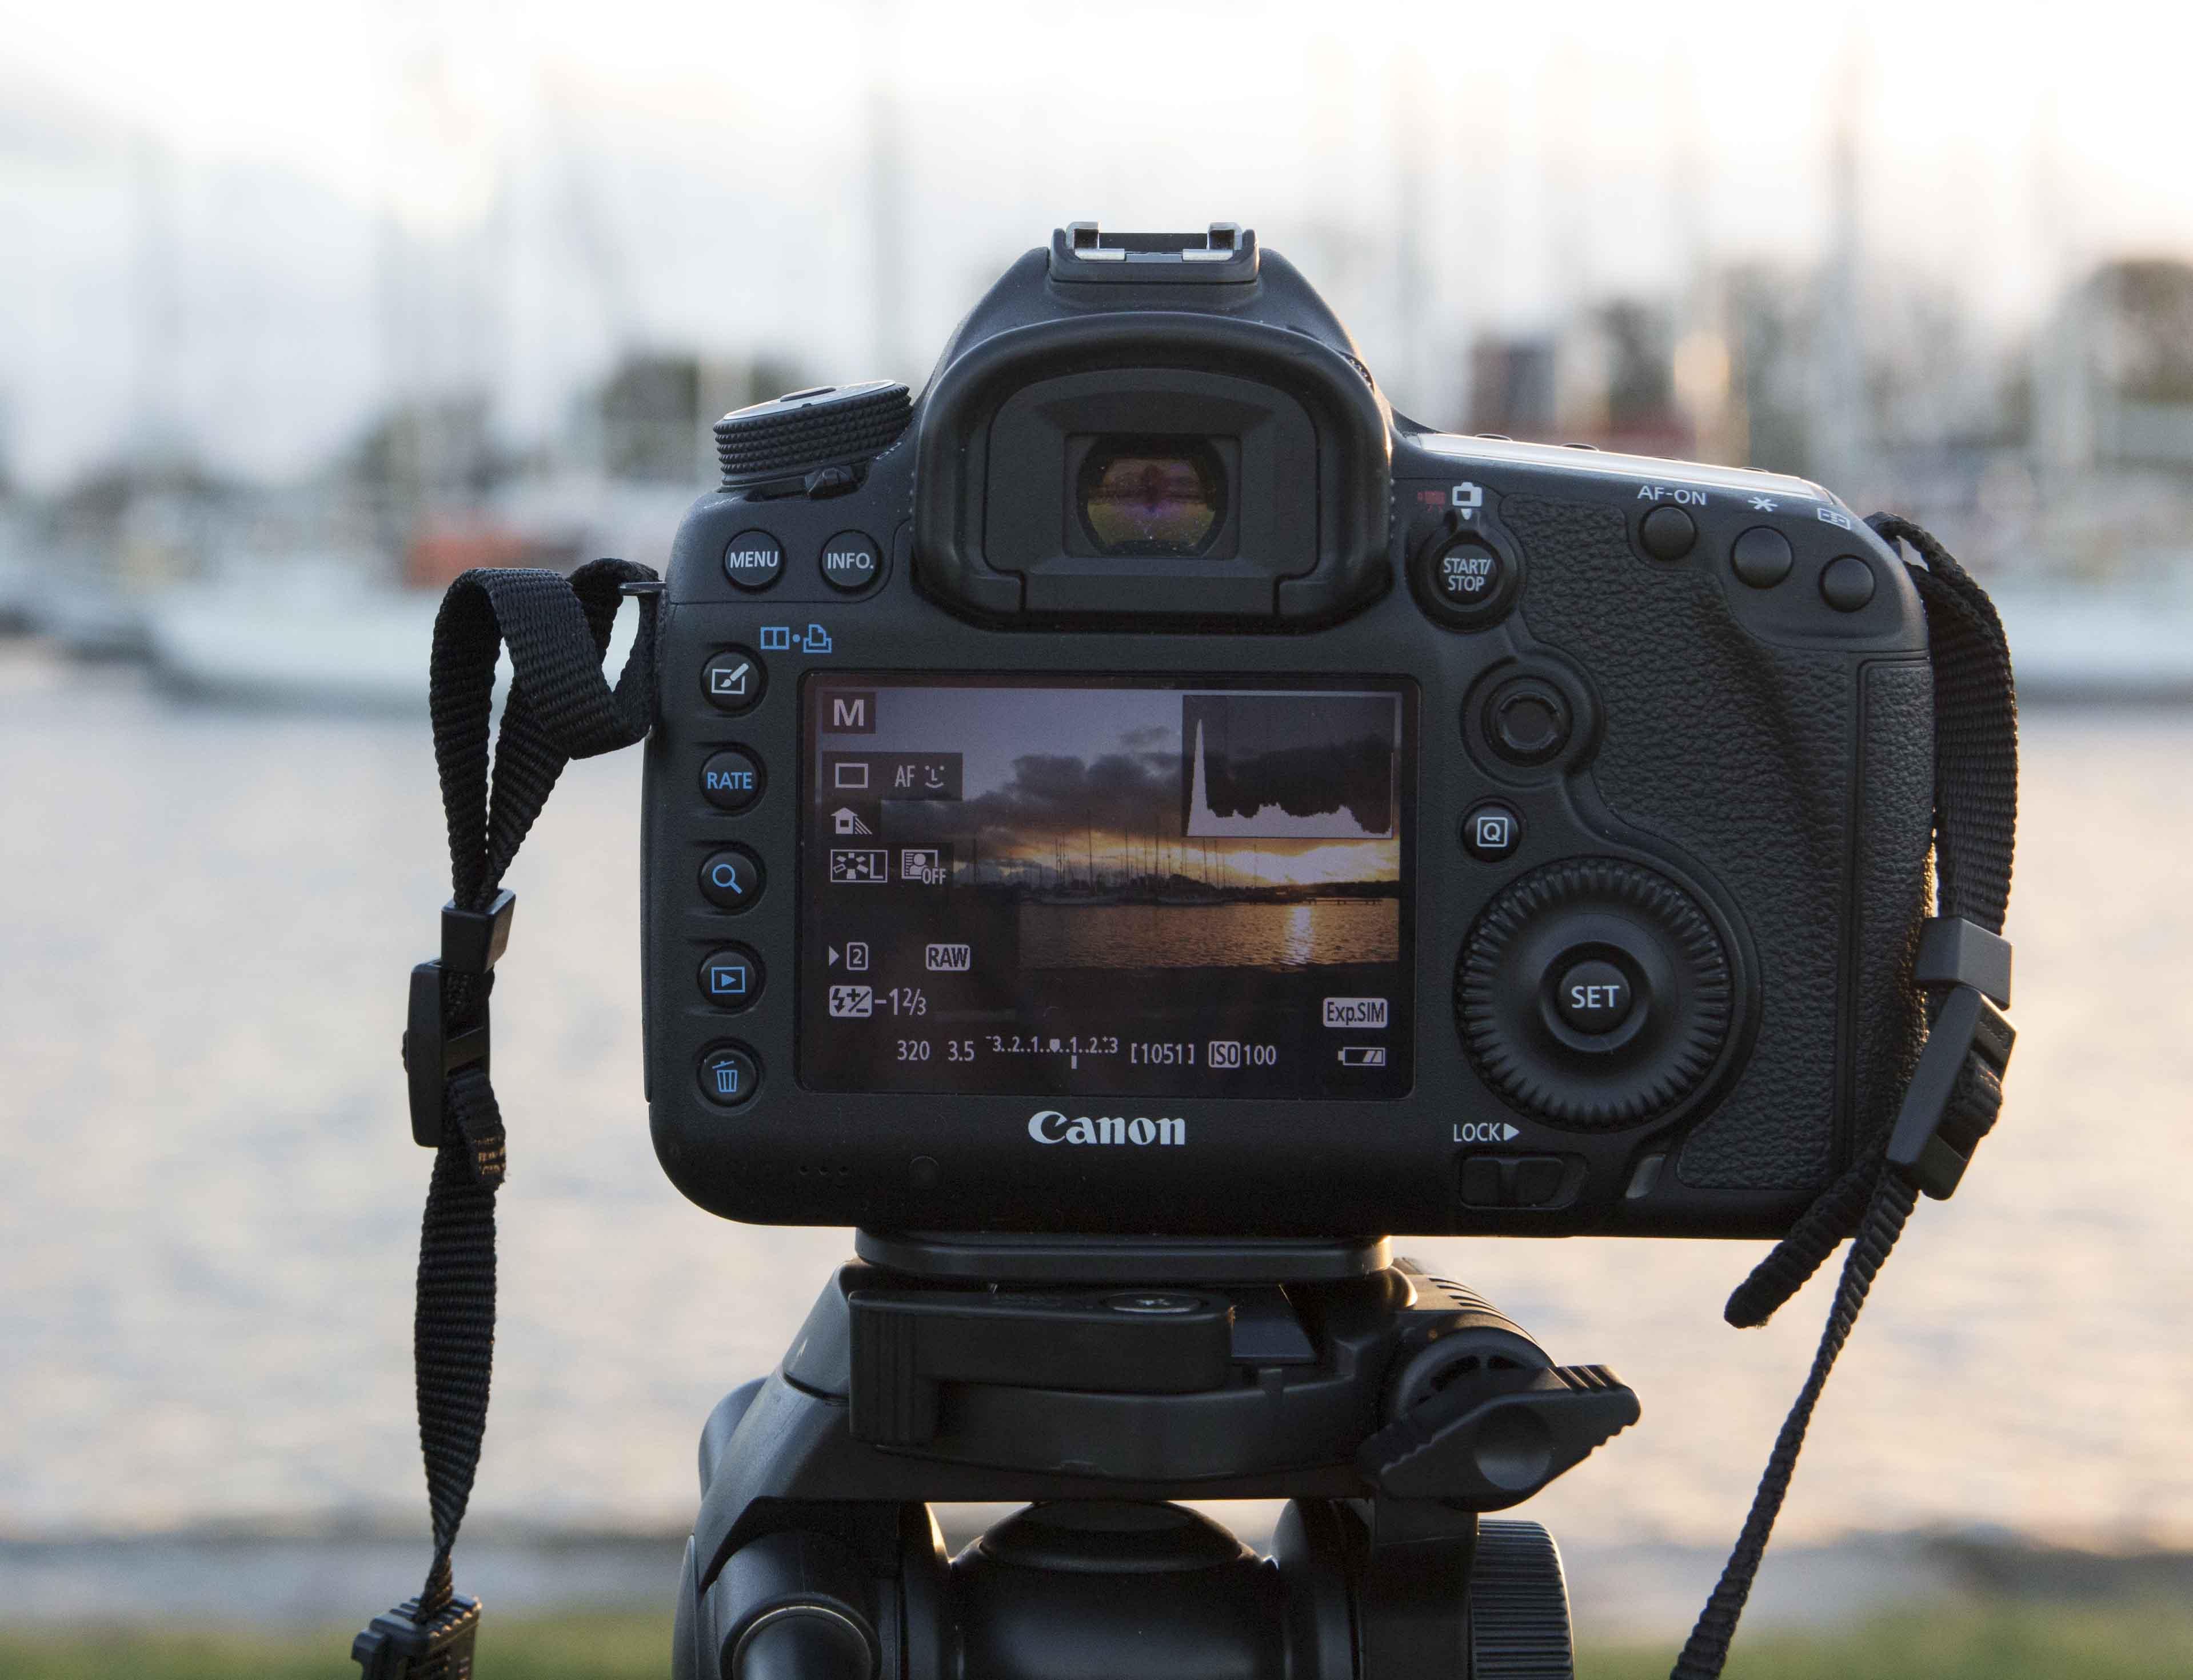 09 Common Mistakes All Beginner Photographers Make